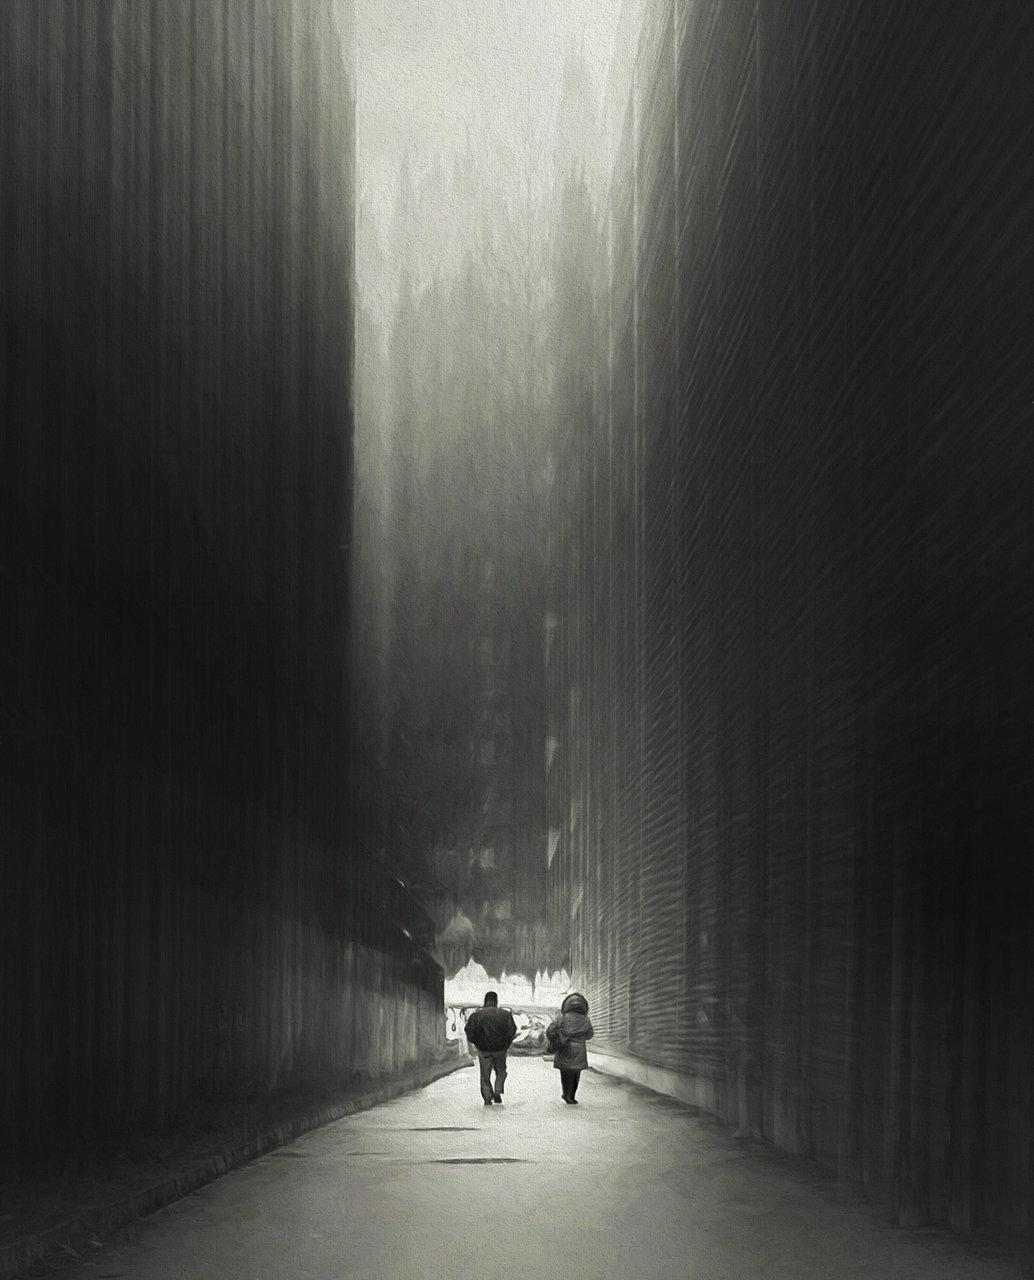 Photo in Abstract | Author Илина Танева - Инка | PHOTO FORUM